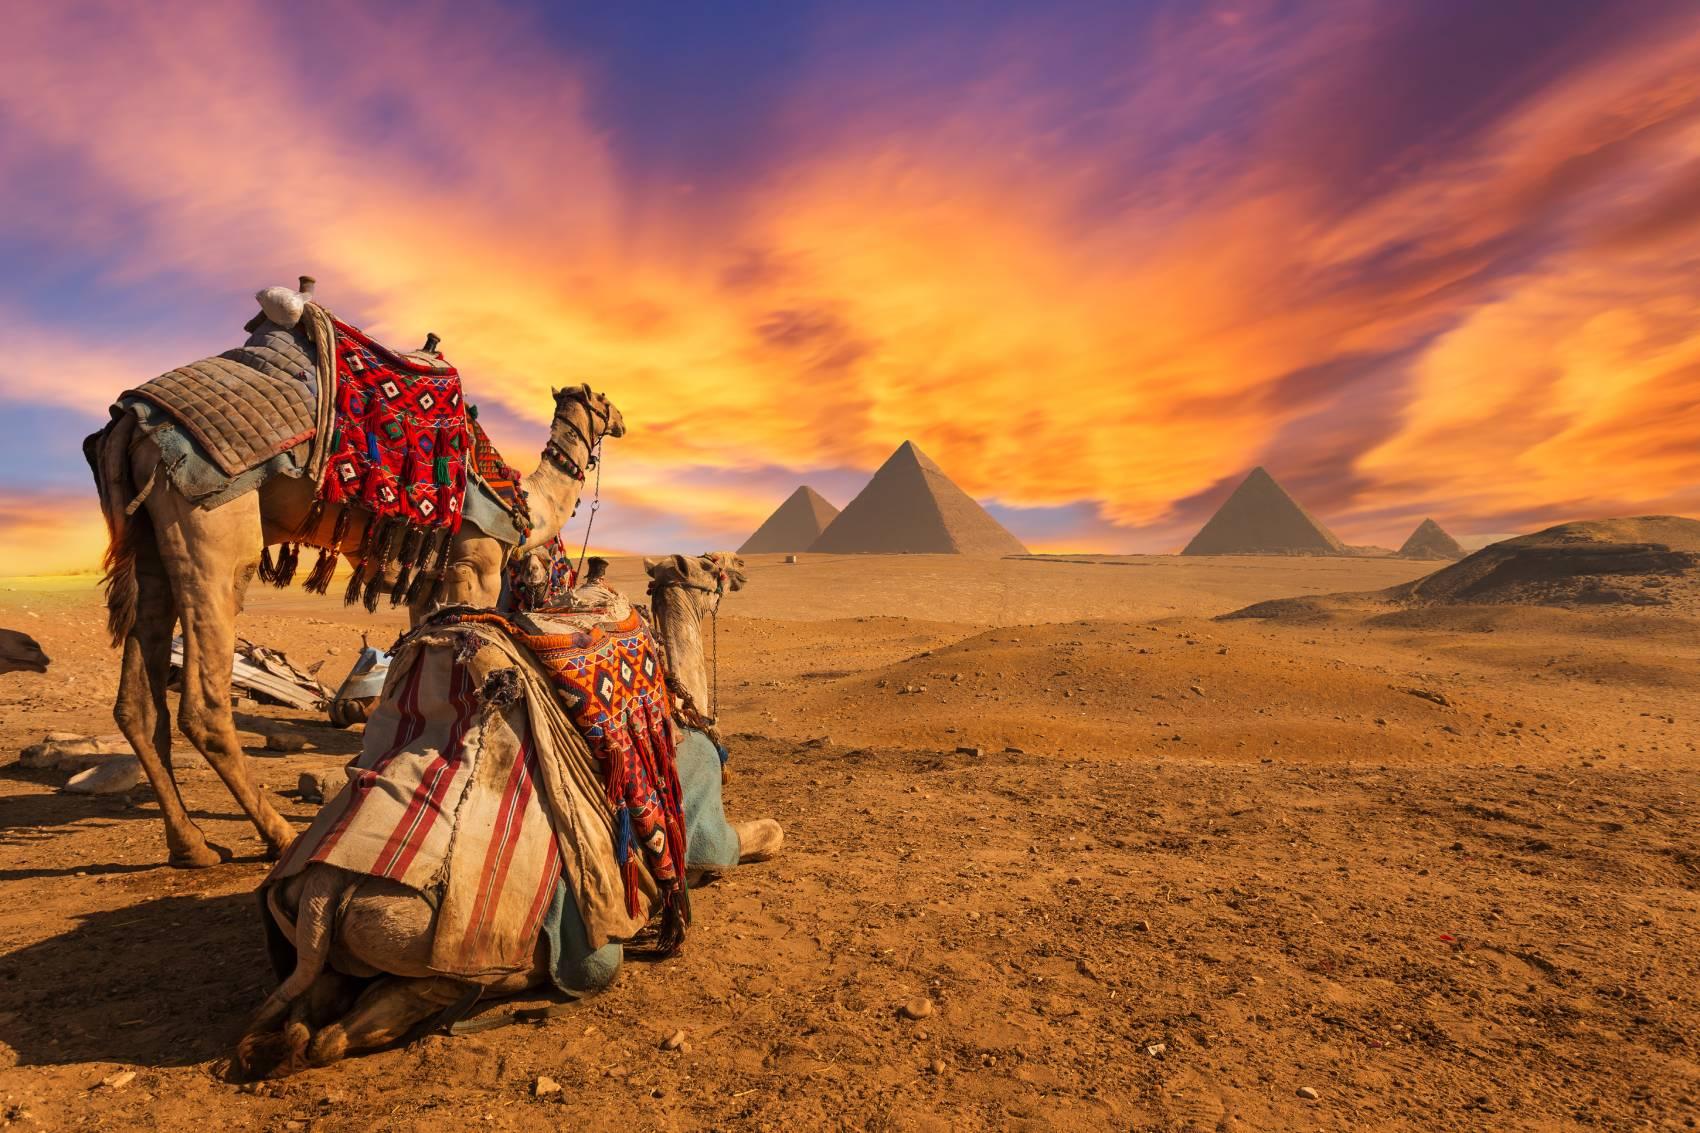 EGIPT, Cairo si Hurghada - circuit cu sejur